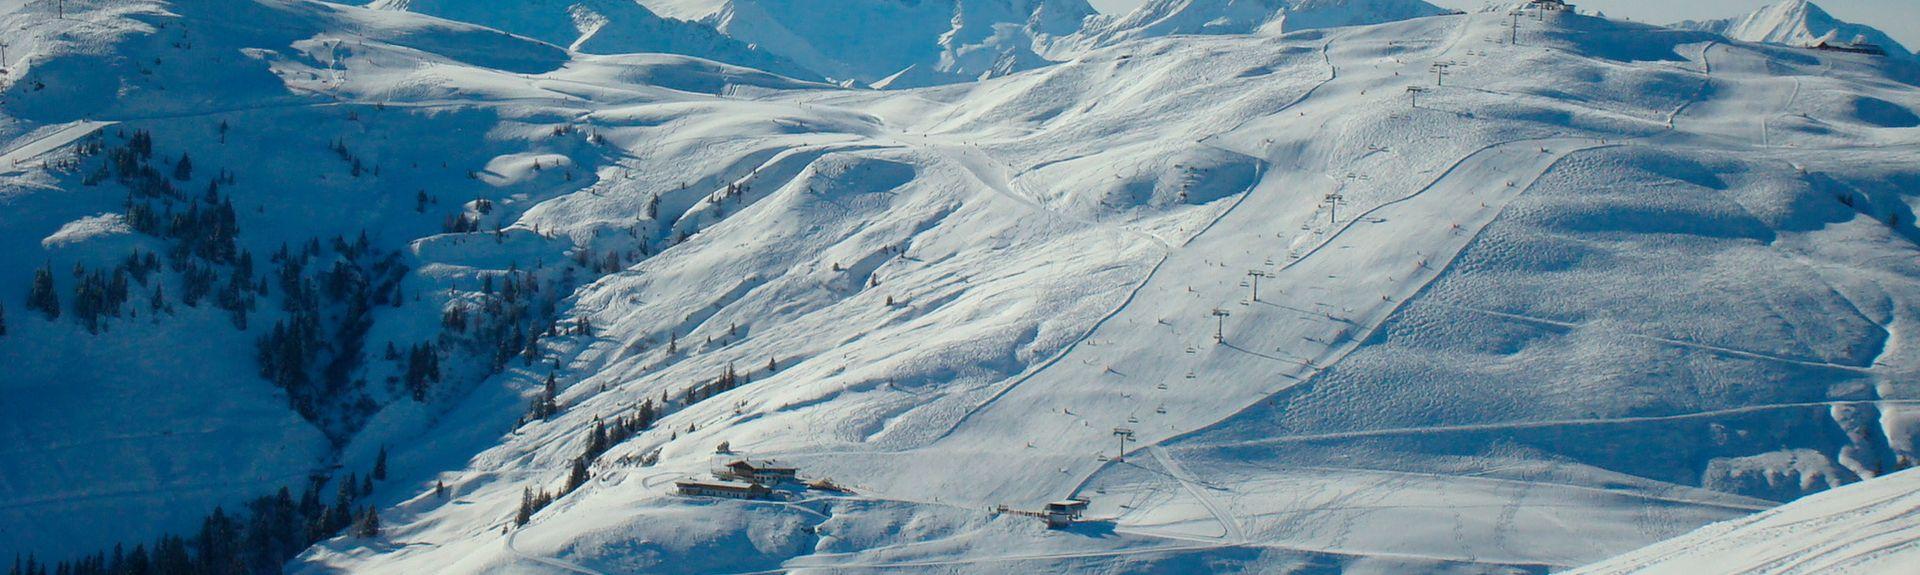 Hochhoerndl Ski Lift, Fieberbrunn, Austria